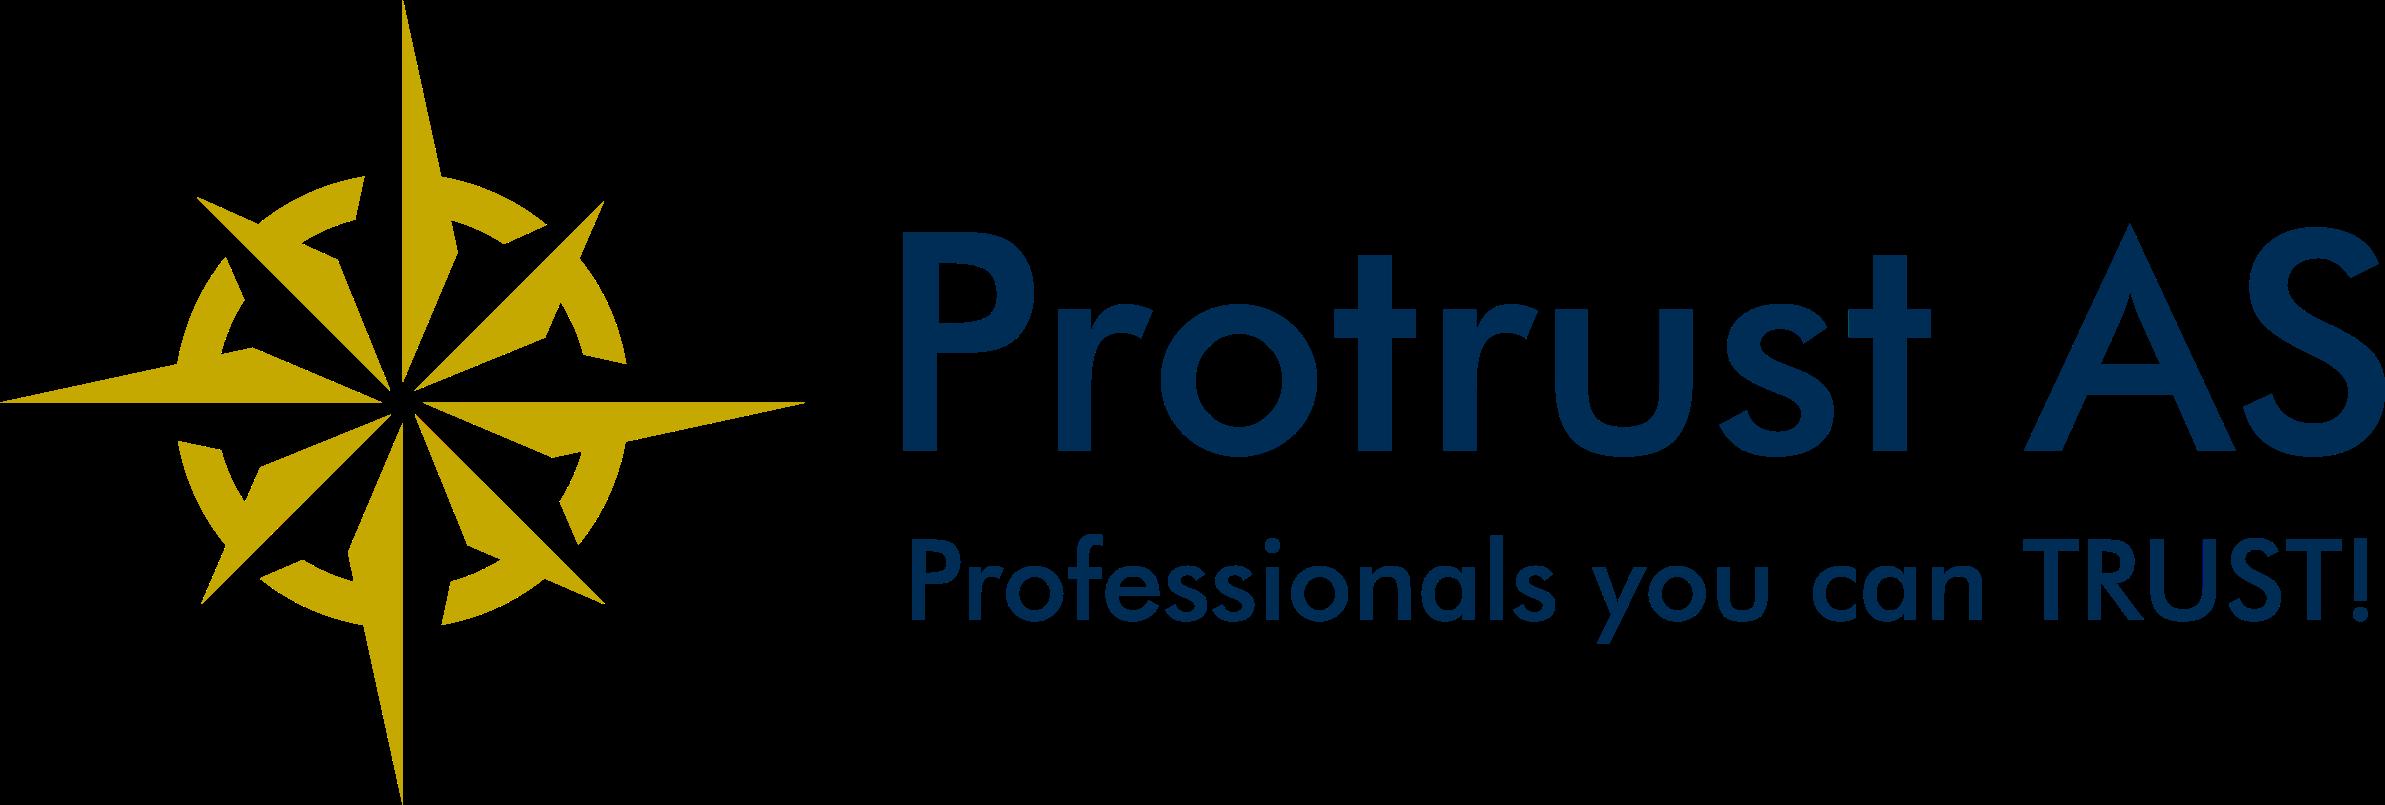 Protrust AS Logo